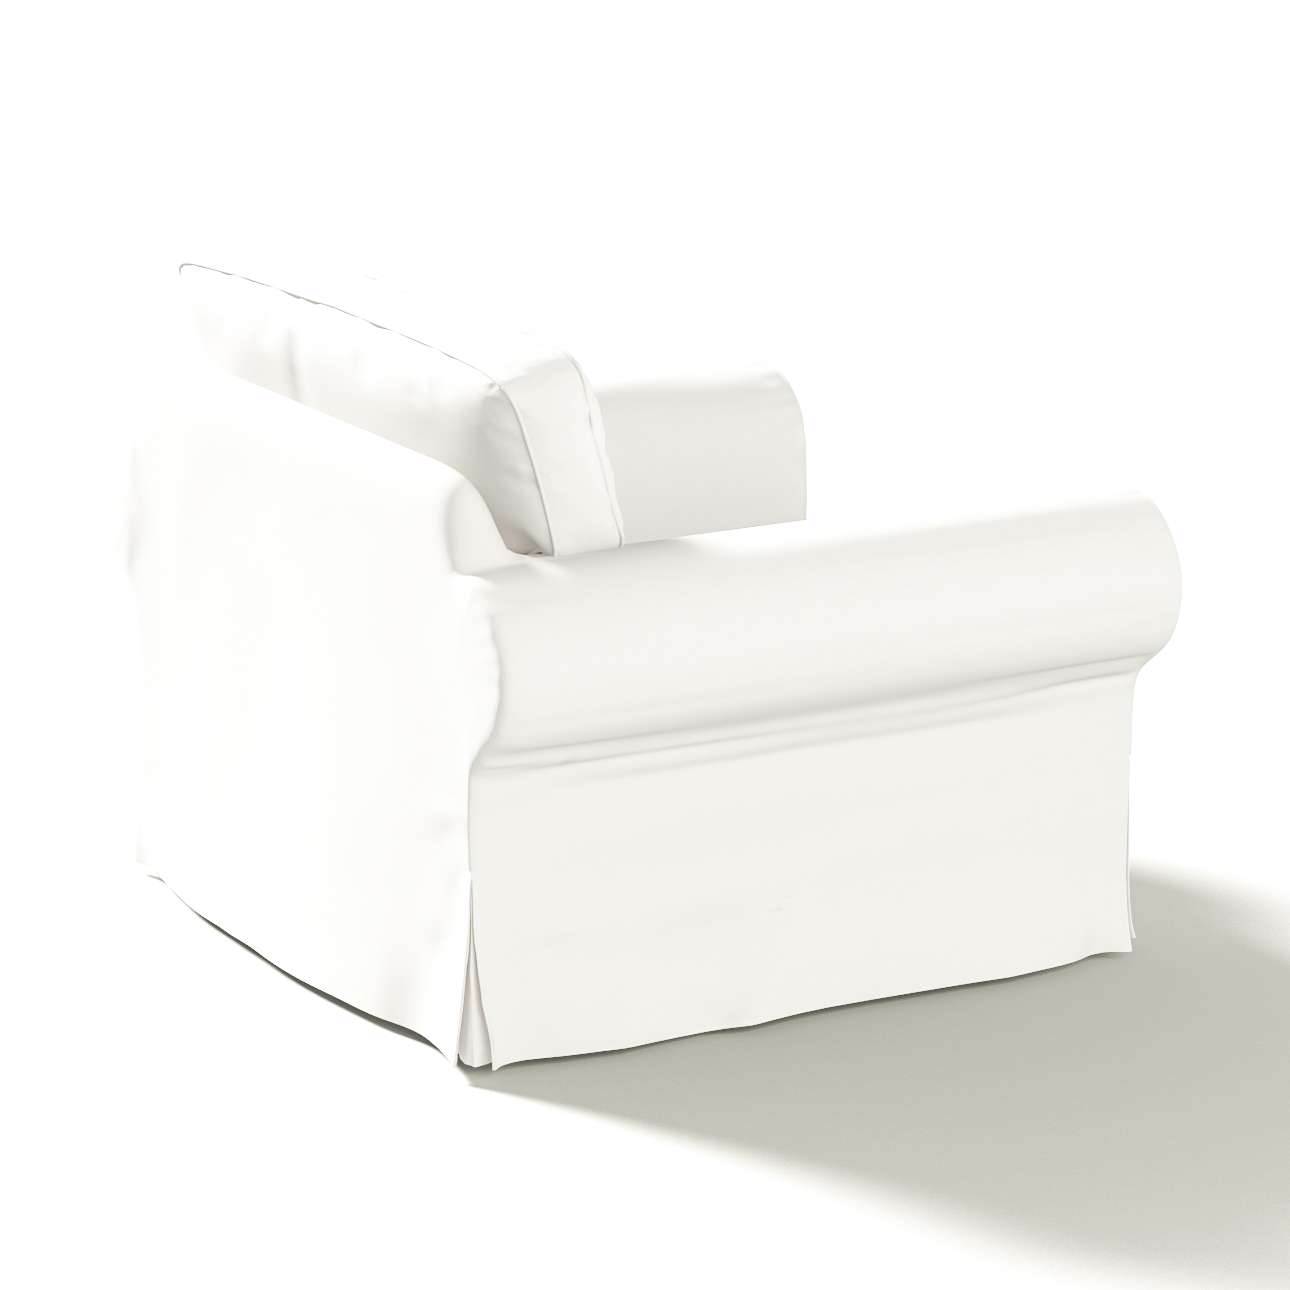 Potah na křeslo IKEA Ektorp v kolekci Cotton Panama, látka: 702-34